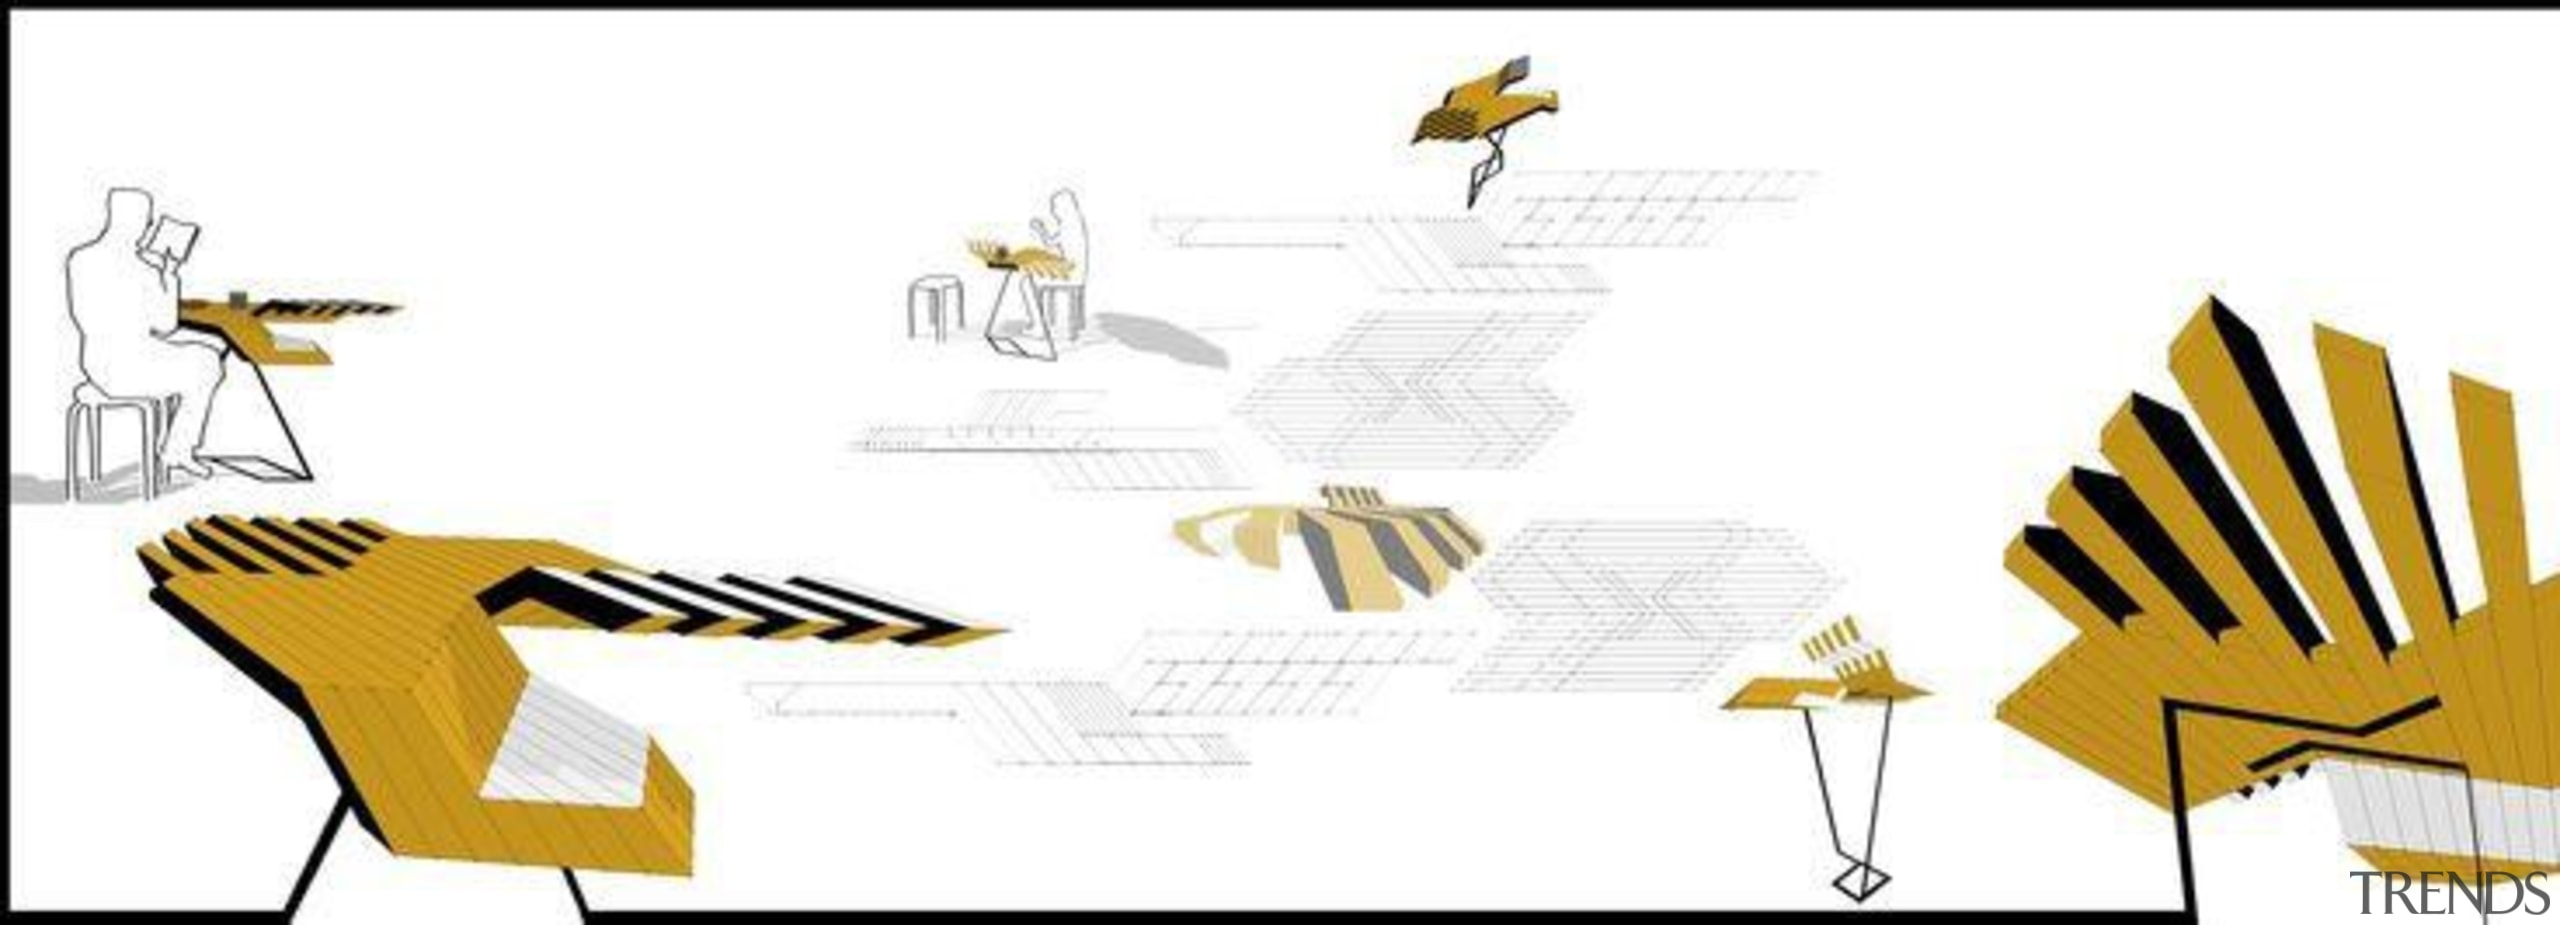 4607283852620d387cdc29f28739615d.jpg - 4607283852620d387cdc29f28739615d.jpg - design | diagram | design, diagram, font, graphic design, illustration, line, product design, text, wing, yellow, white